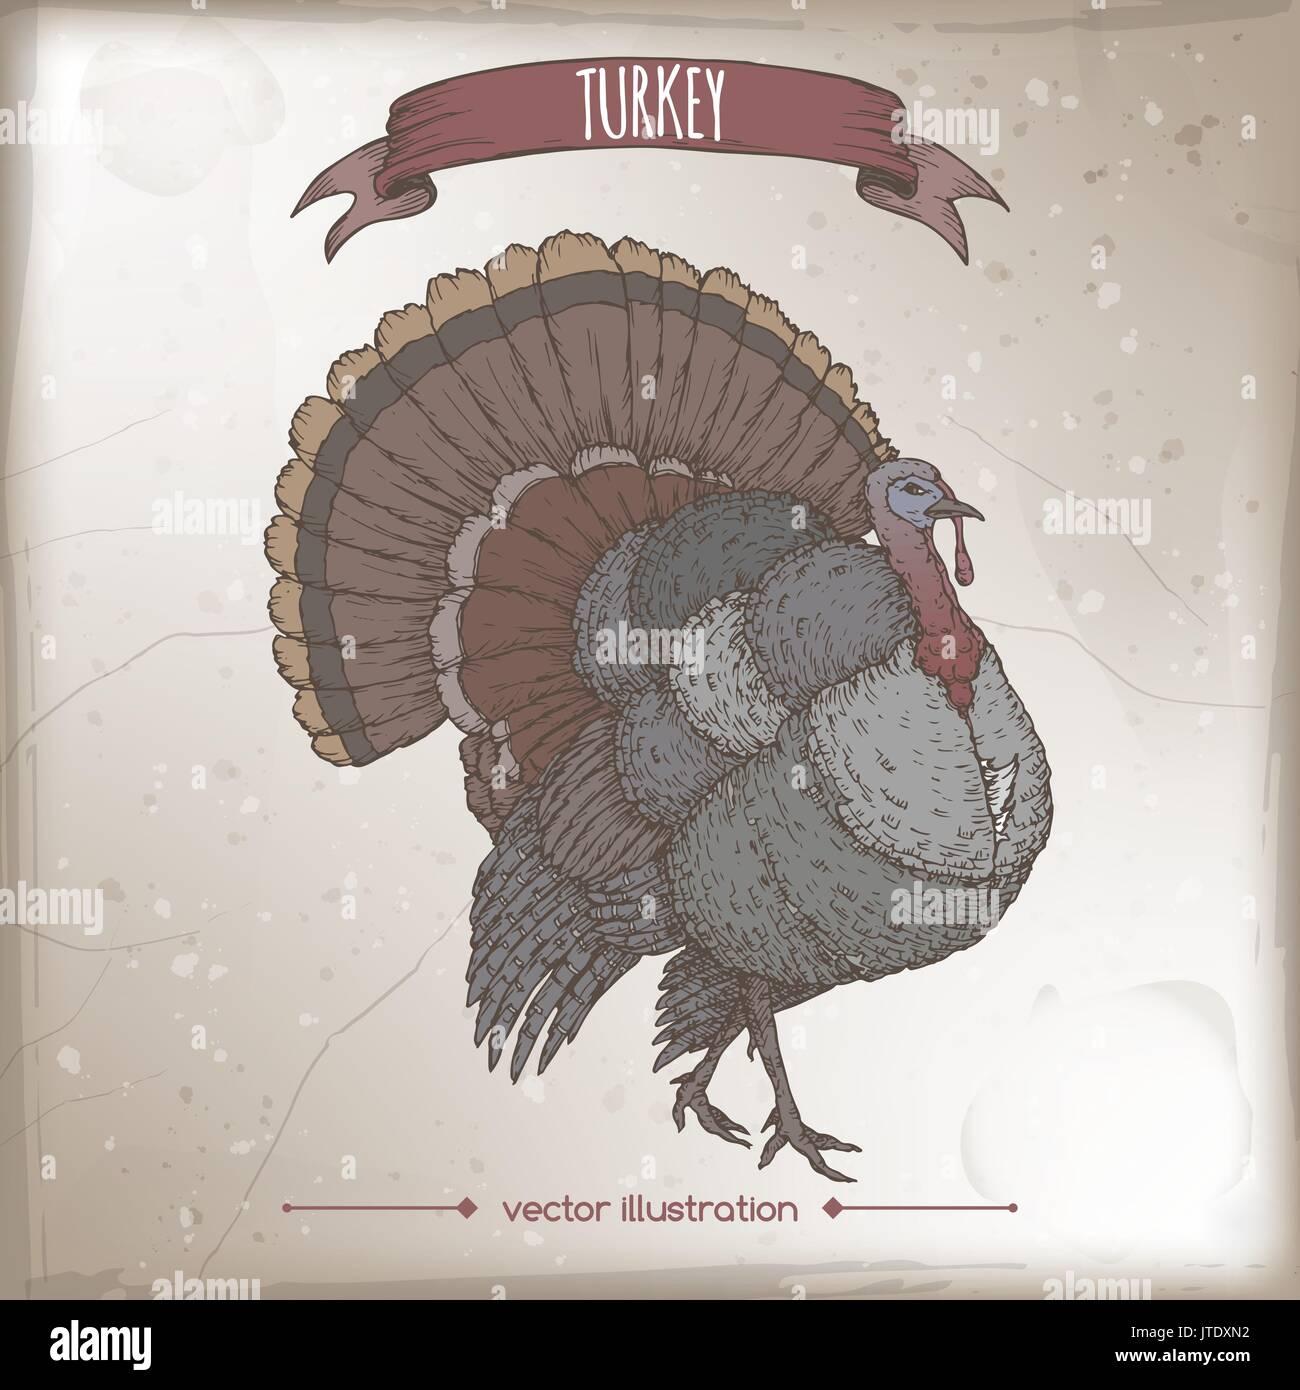 Vintage label with color live domestic turkey sketch. - Stock Vector